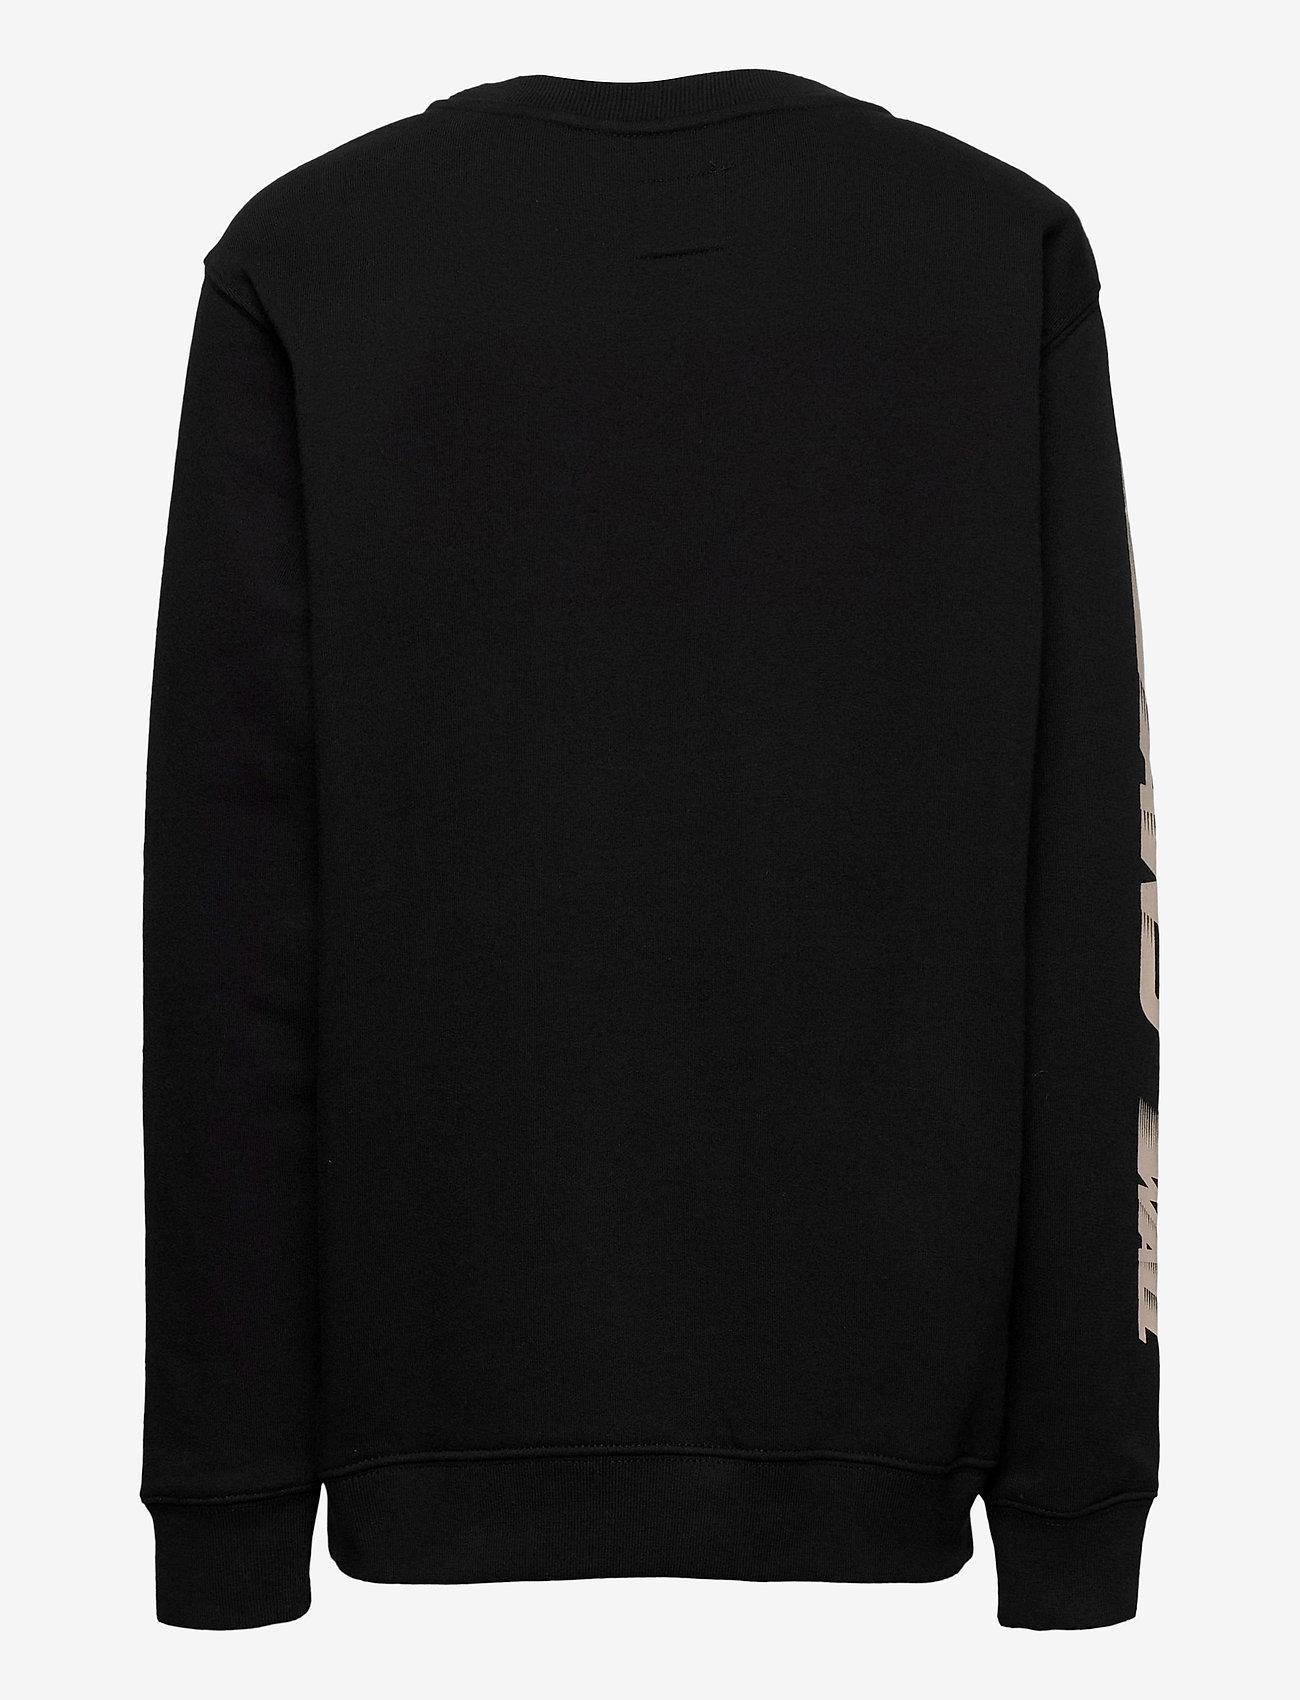 VANS - RACERS EDGE CREW BOYS - sweatshirts - black - 1